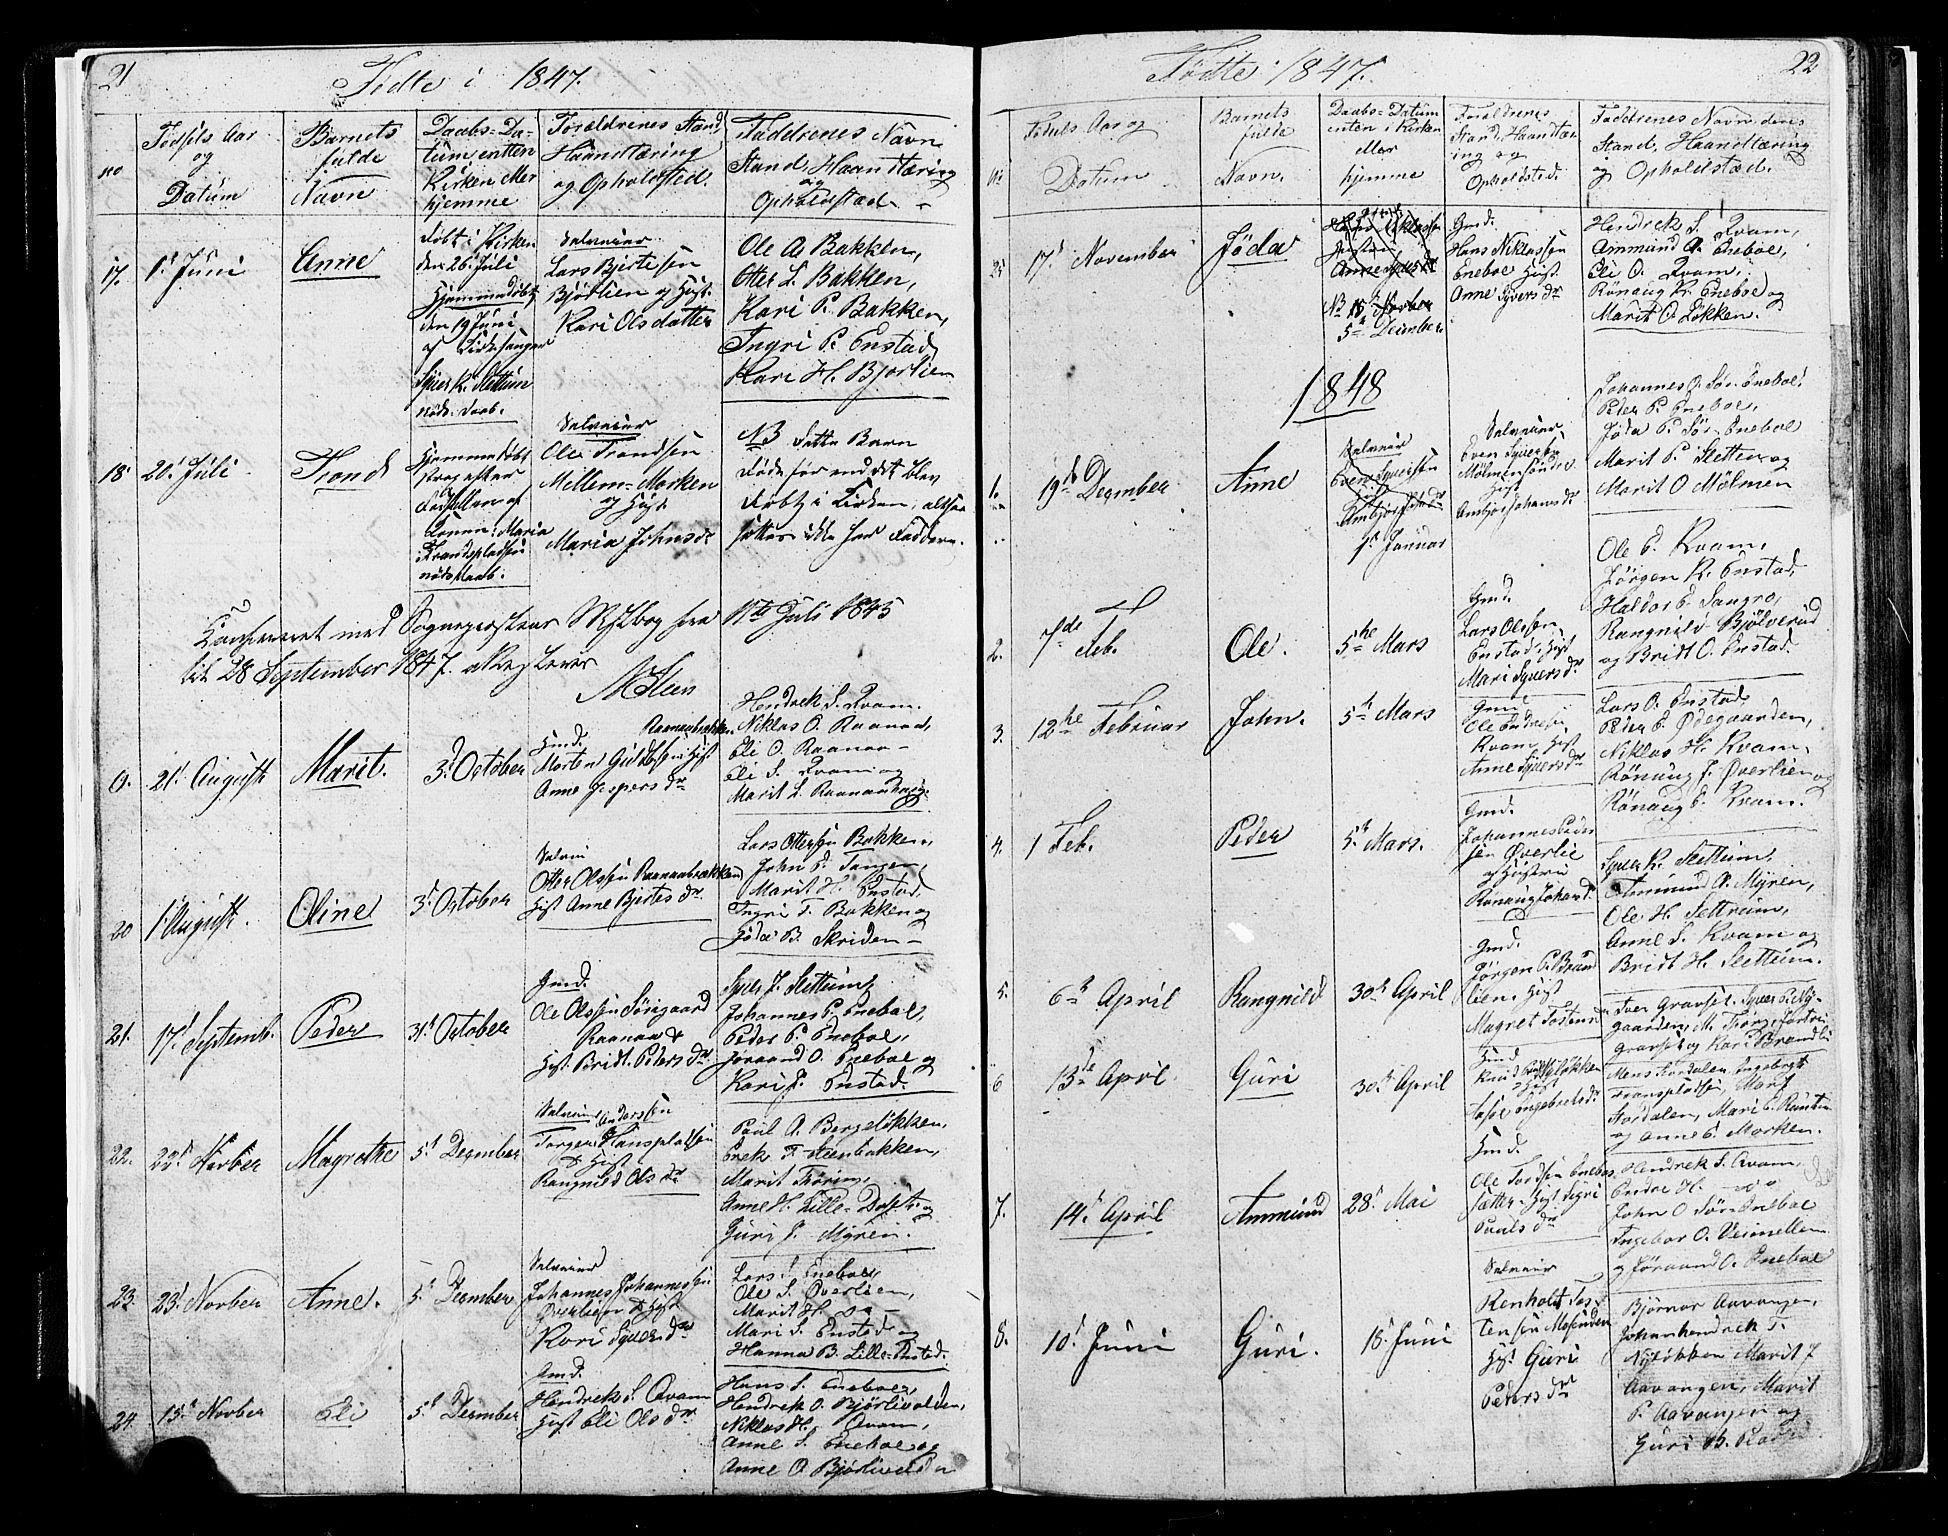 SAH, Lesja prestekontor, Klokkerbok nr. 4, 1842-1871, s. 21-22